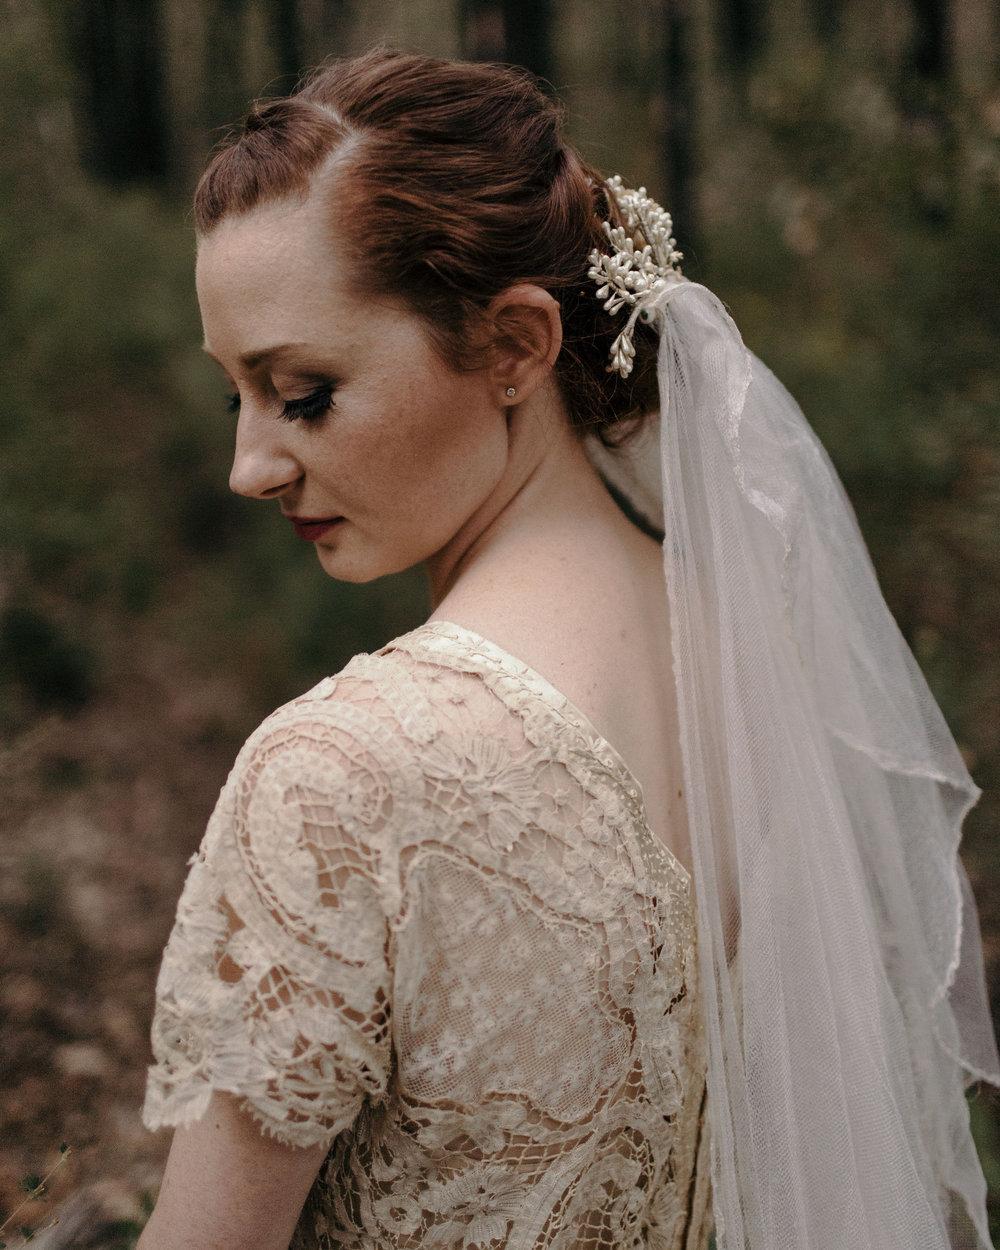 CARTER-ROSE-PHOTOGRAPHY-NICHOLAS-WEDDING-NANGA-BUSH-CAMP485.JPG